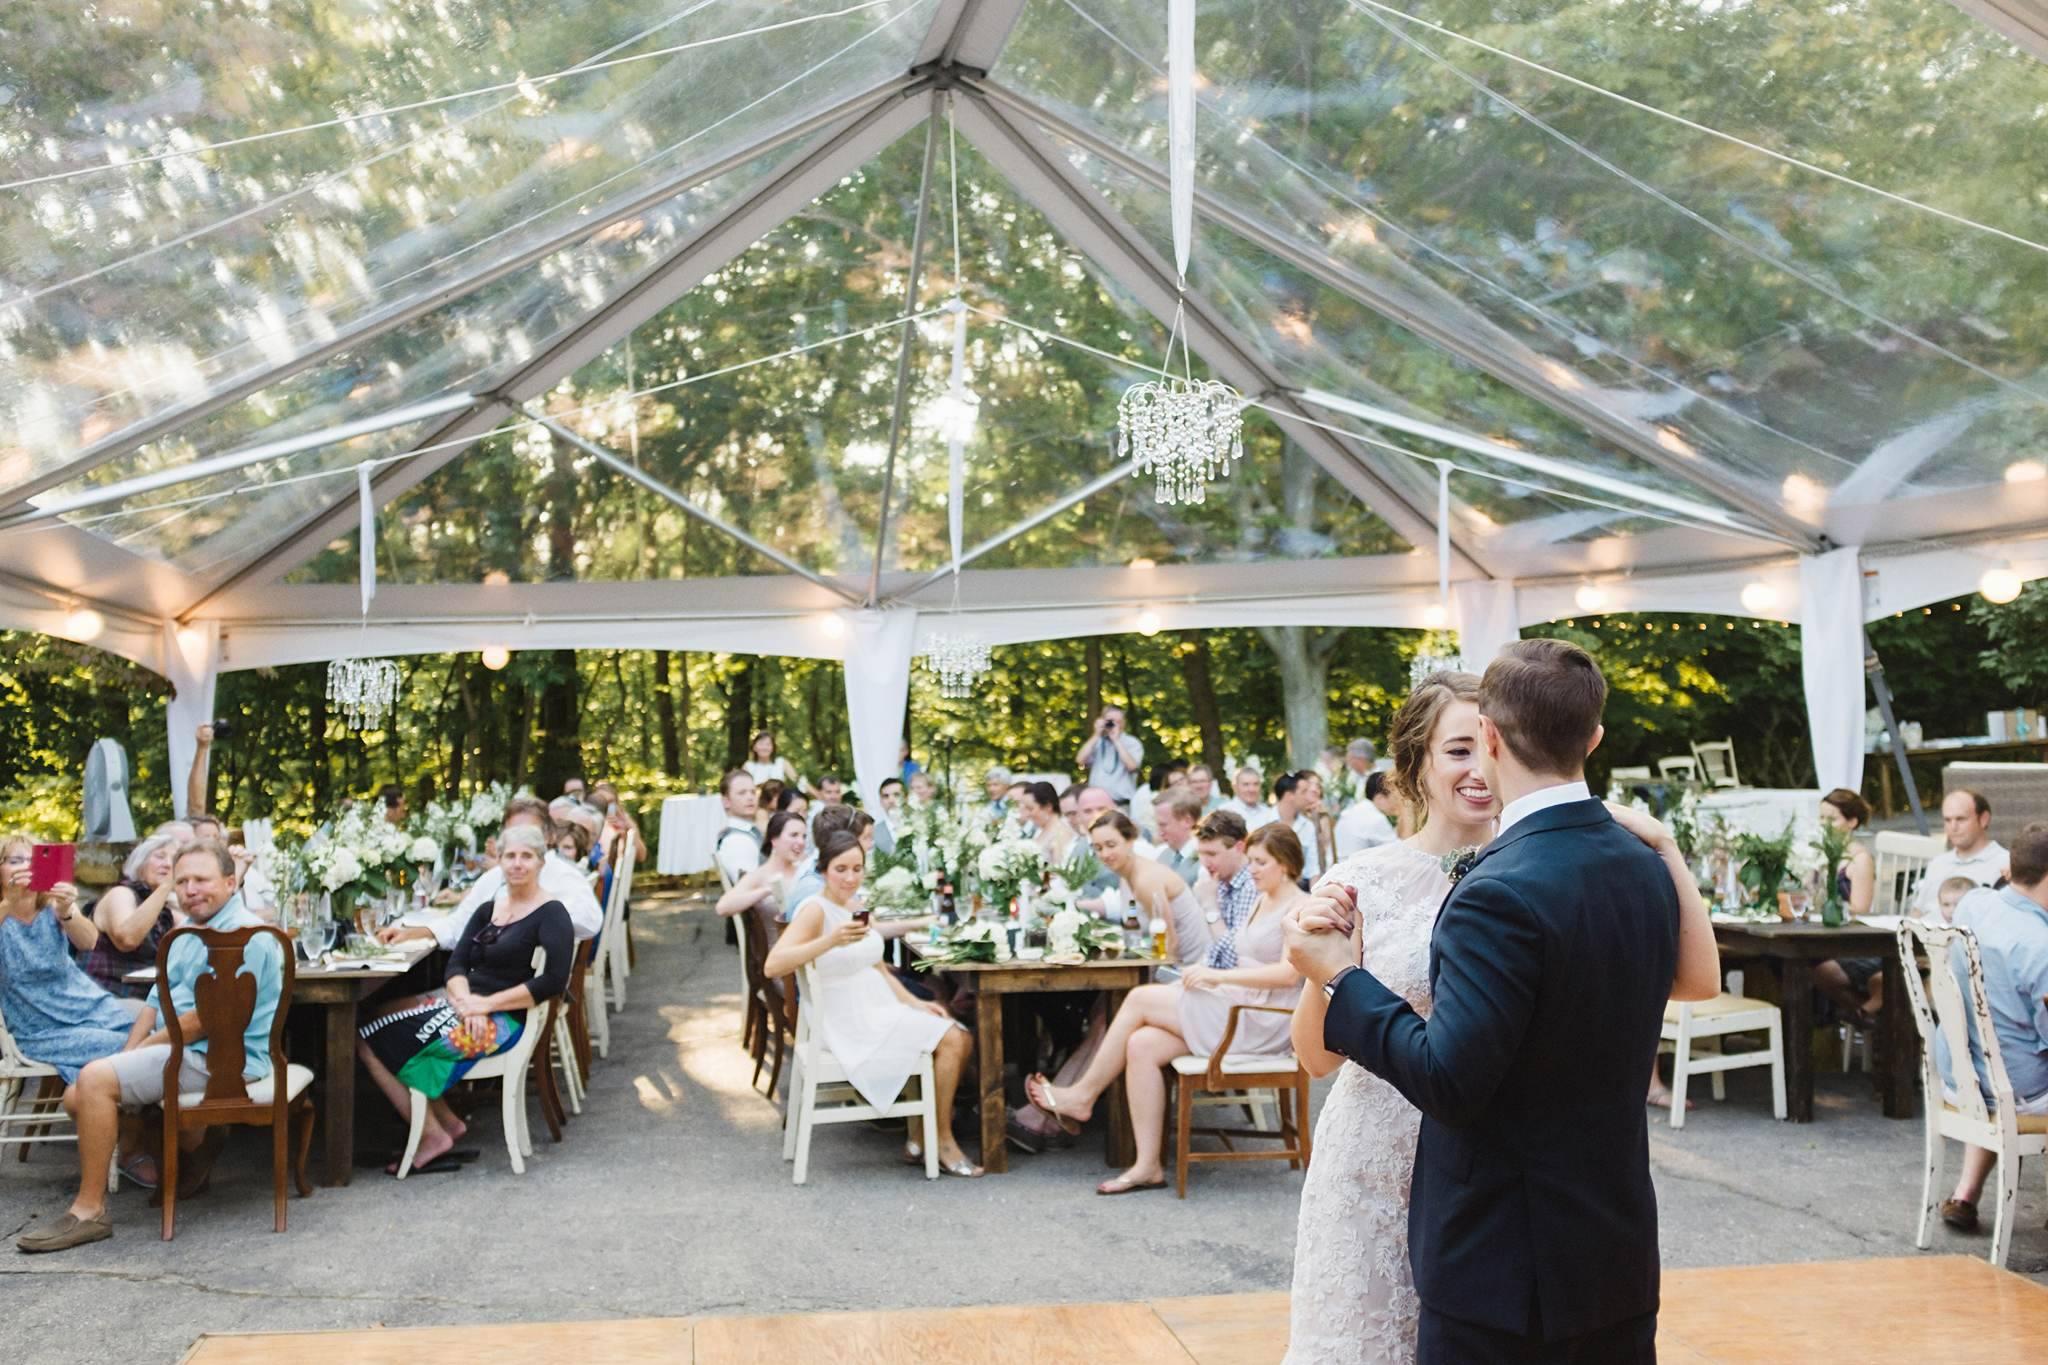 pole tents frame tents wedding tents clear top tent seward